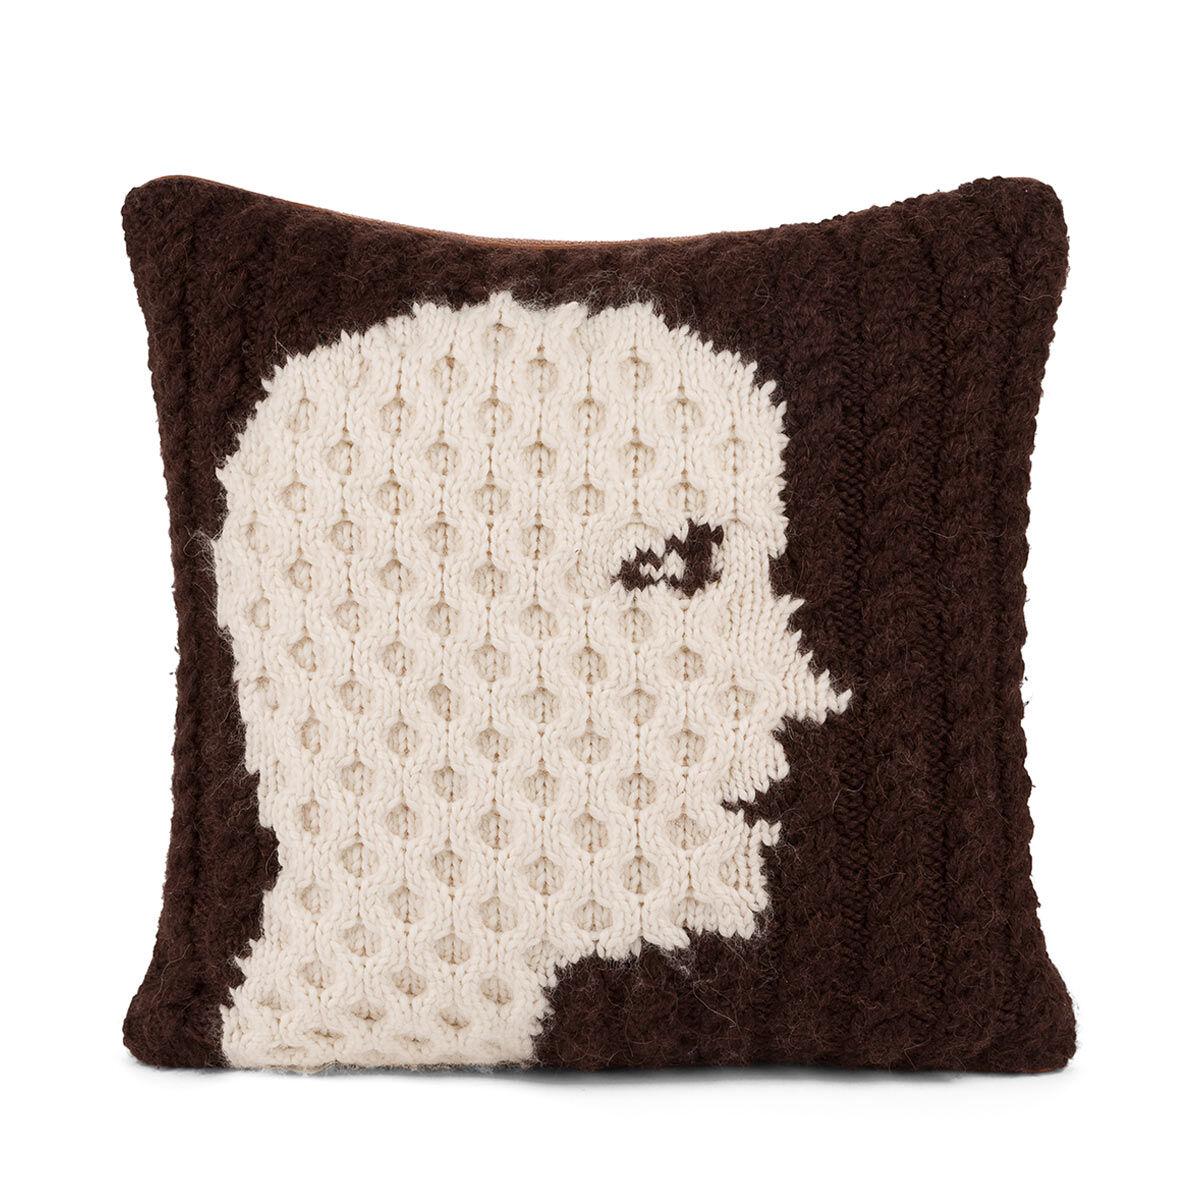 LOEWE Hand Knitted Cushion 1 40X40 ダークブラウン/ホワイト all